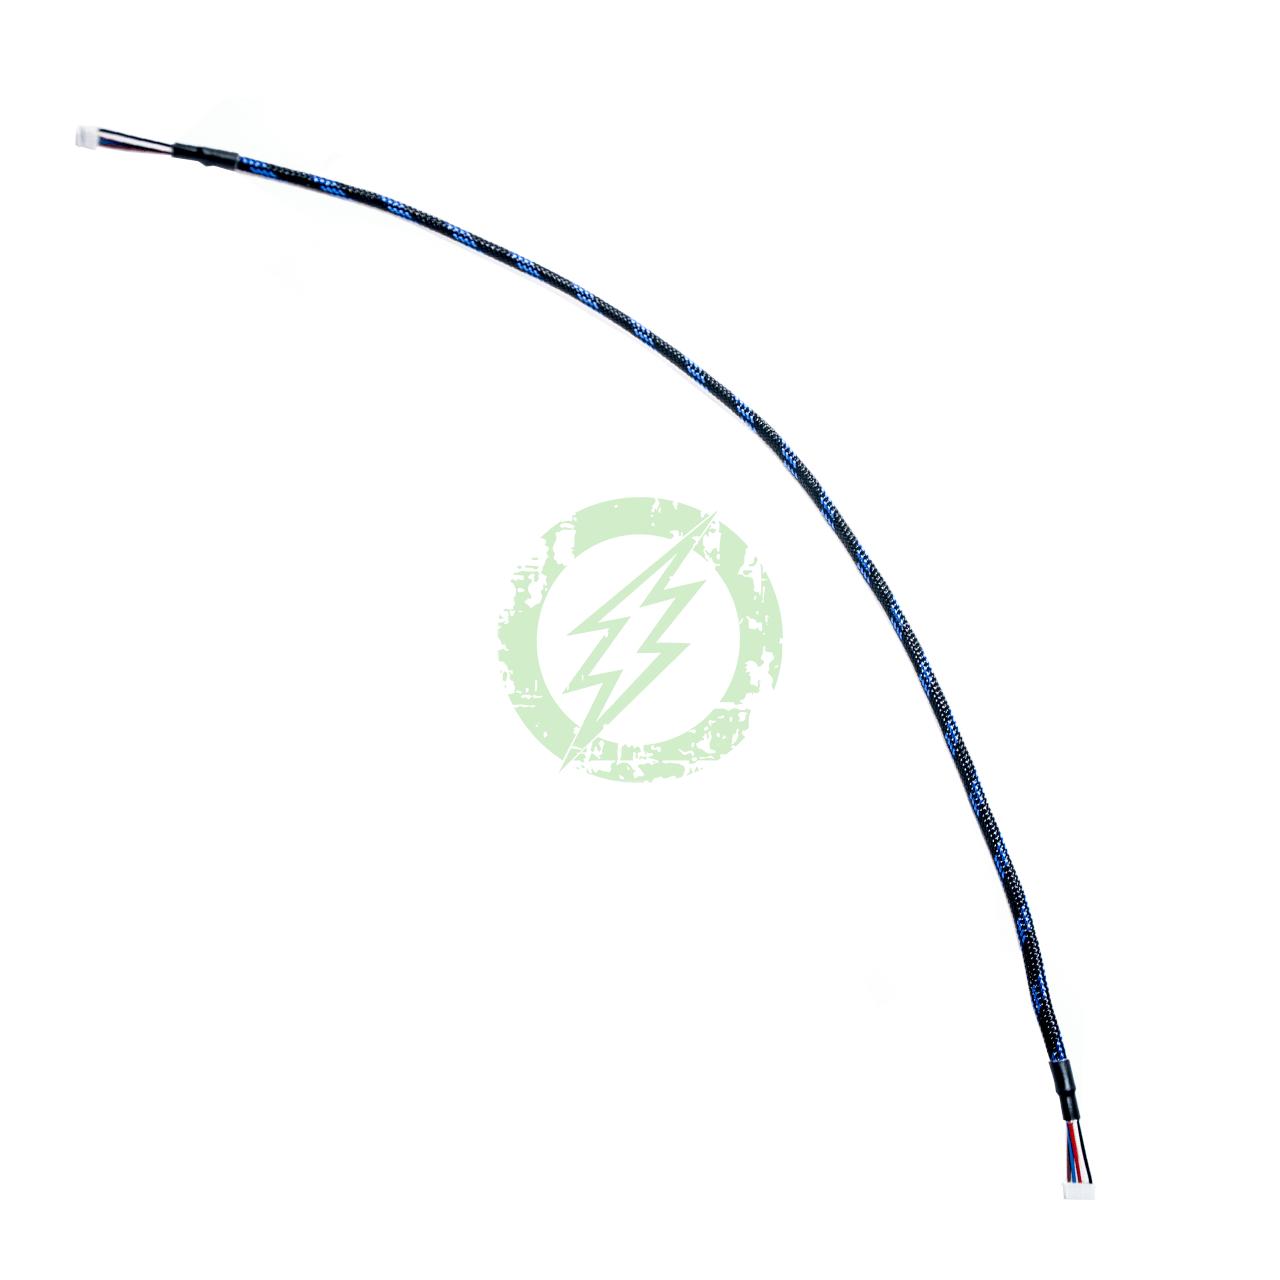 "PolarStar - Fusion Engine/JACK/F1/F2 Wire Harness (18"")"